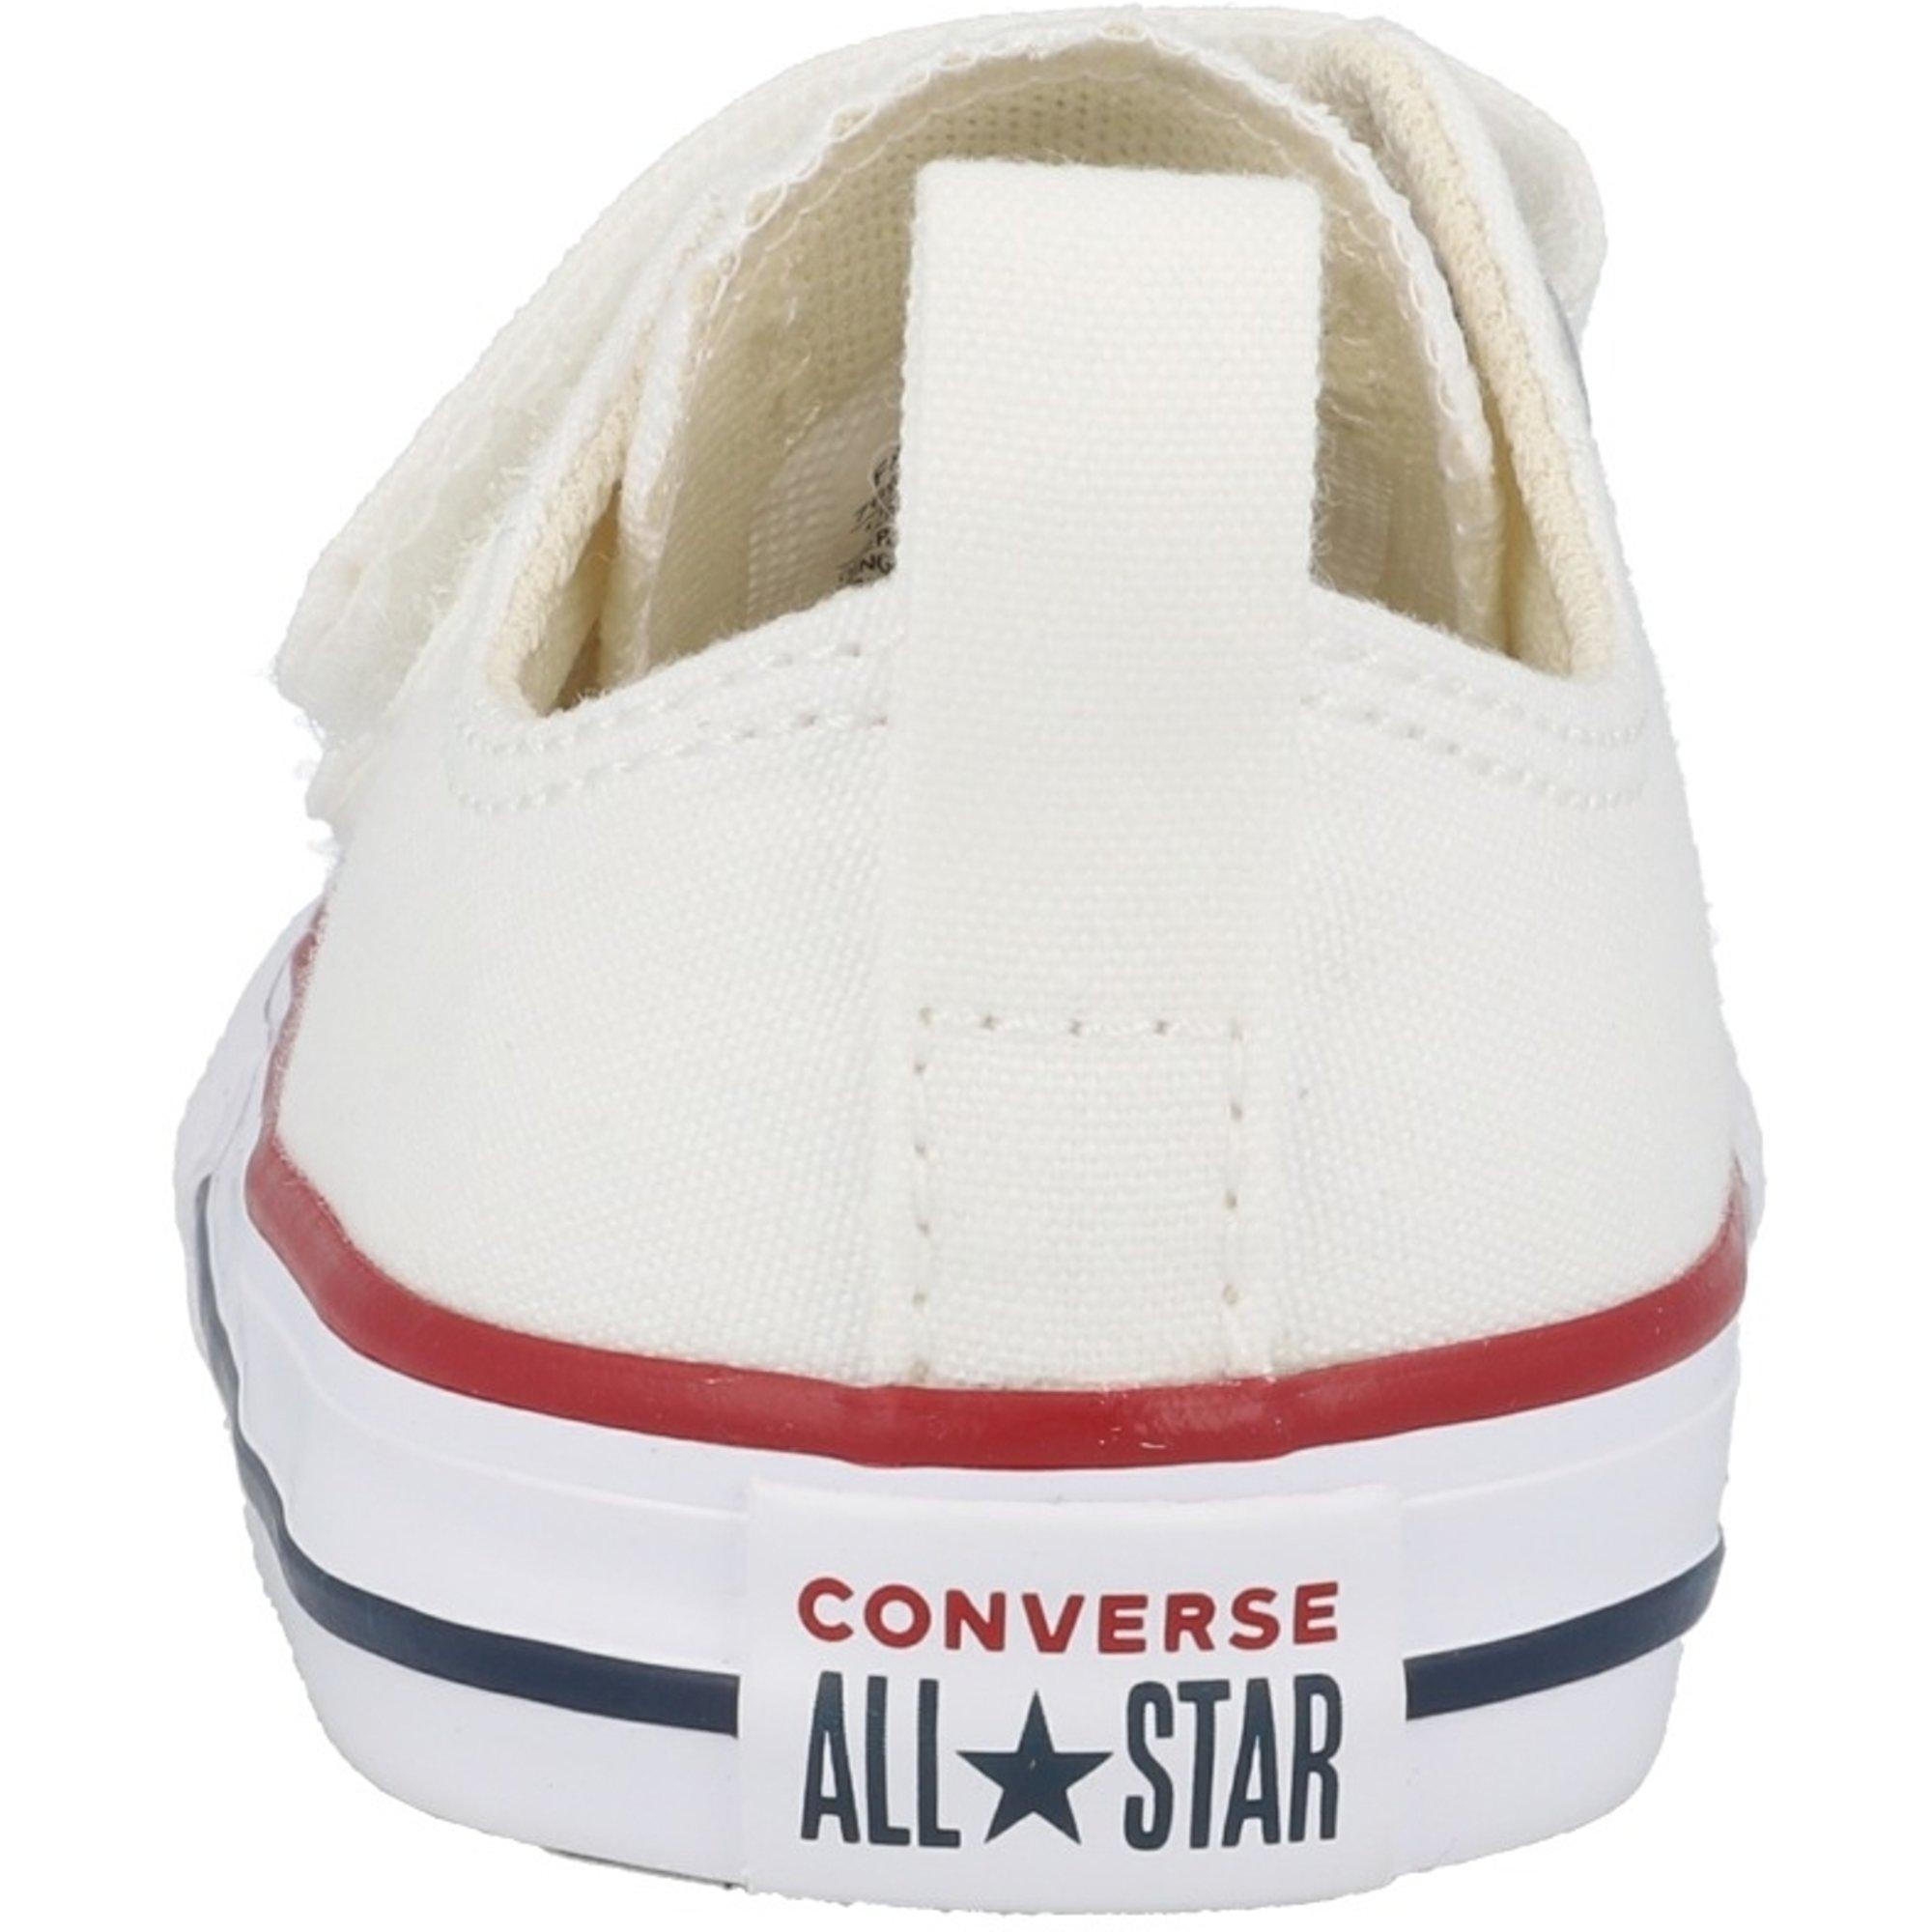 Converse Chuck Taylor All Star 2V Ox White/Navy Canvas